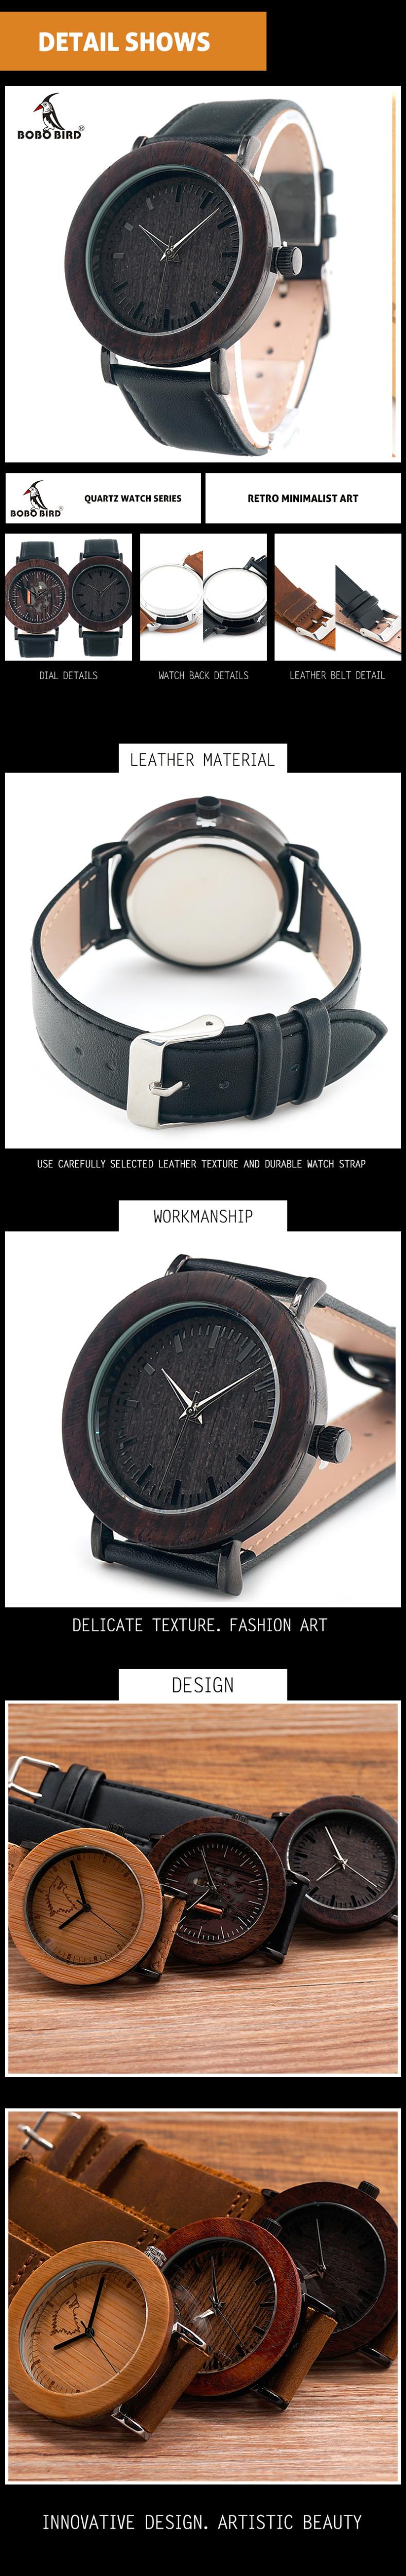 BOBO BIRD Wood Wristwatch Women Watches Genuine Leather Band relogio feminino C-K17 (16)